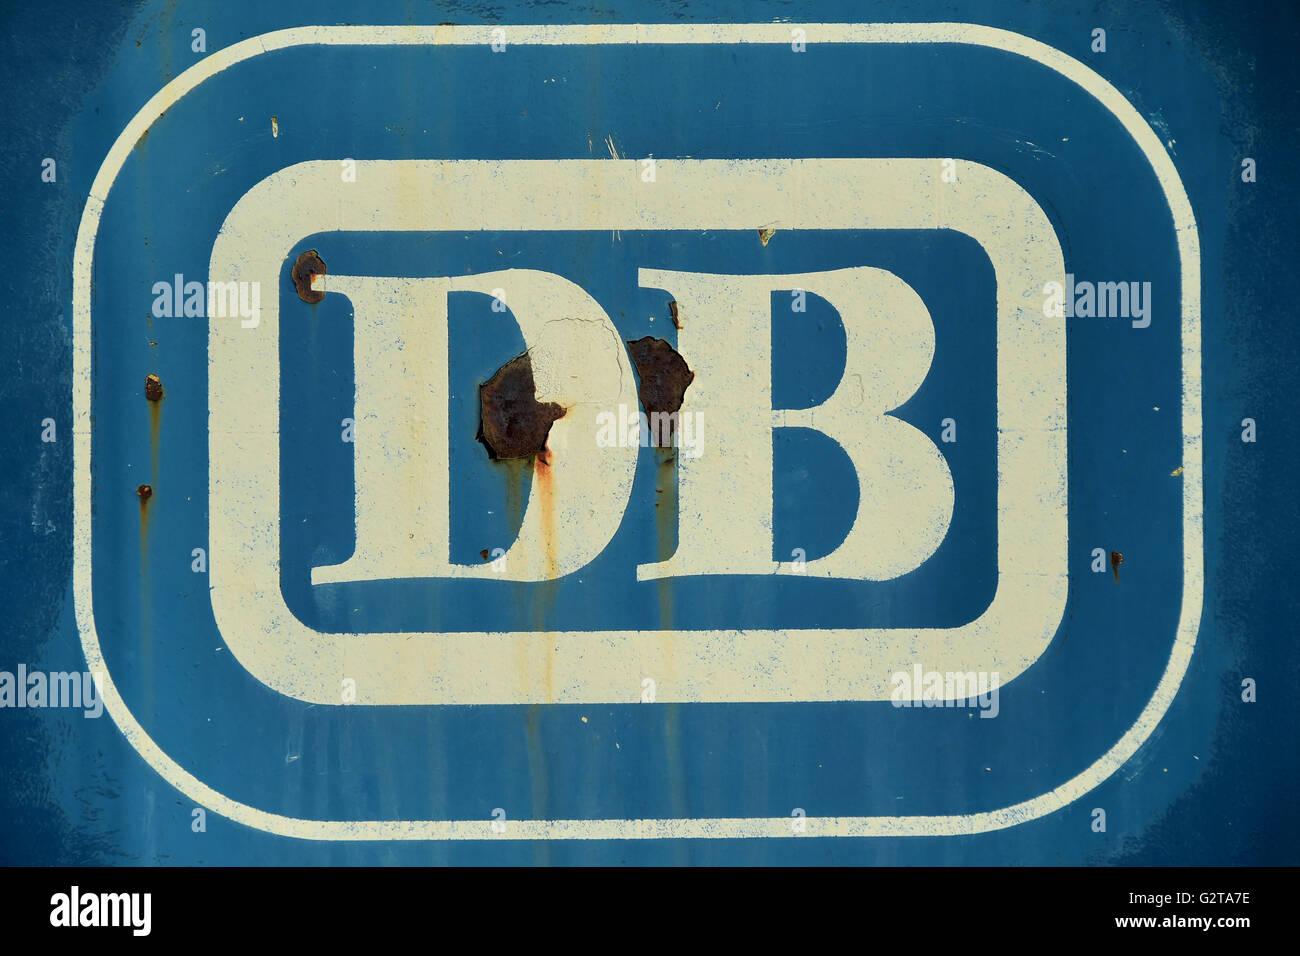 30.09.2015, Bochum, North Rhine-Westphalia, Germany - Logo of the German Railways at a Elektrolok. The German Federal Stock Photo